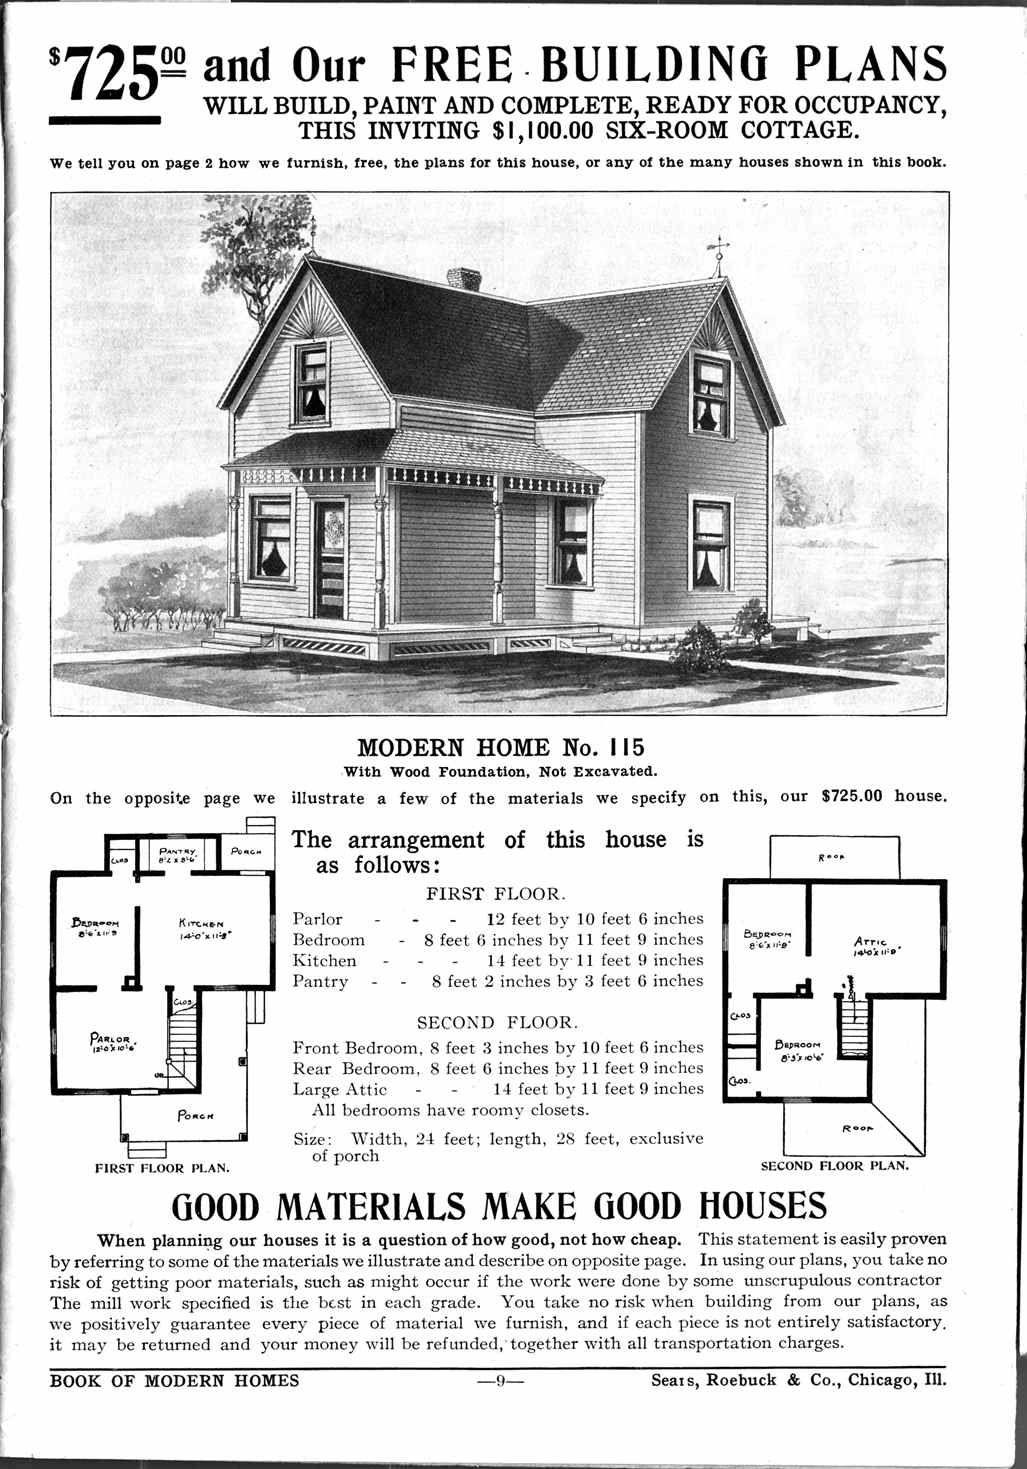 Modern Home No 115 Sears Roebuck & Co